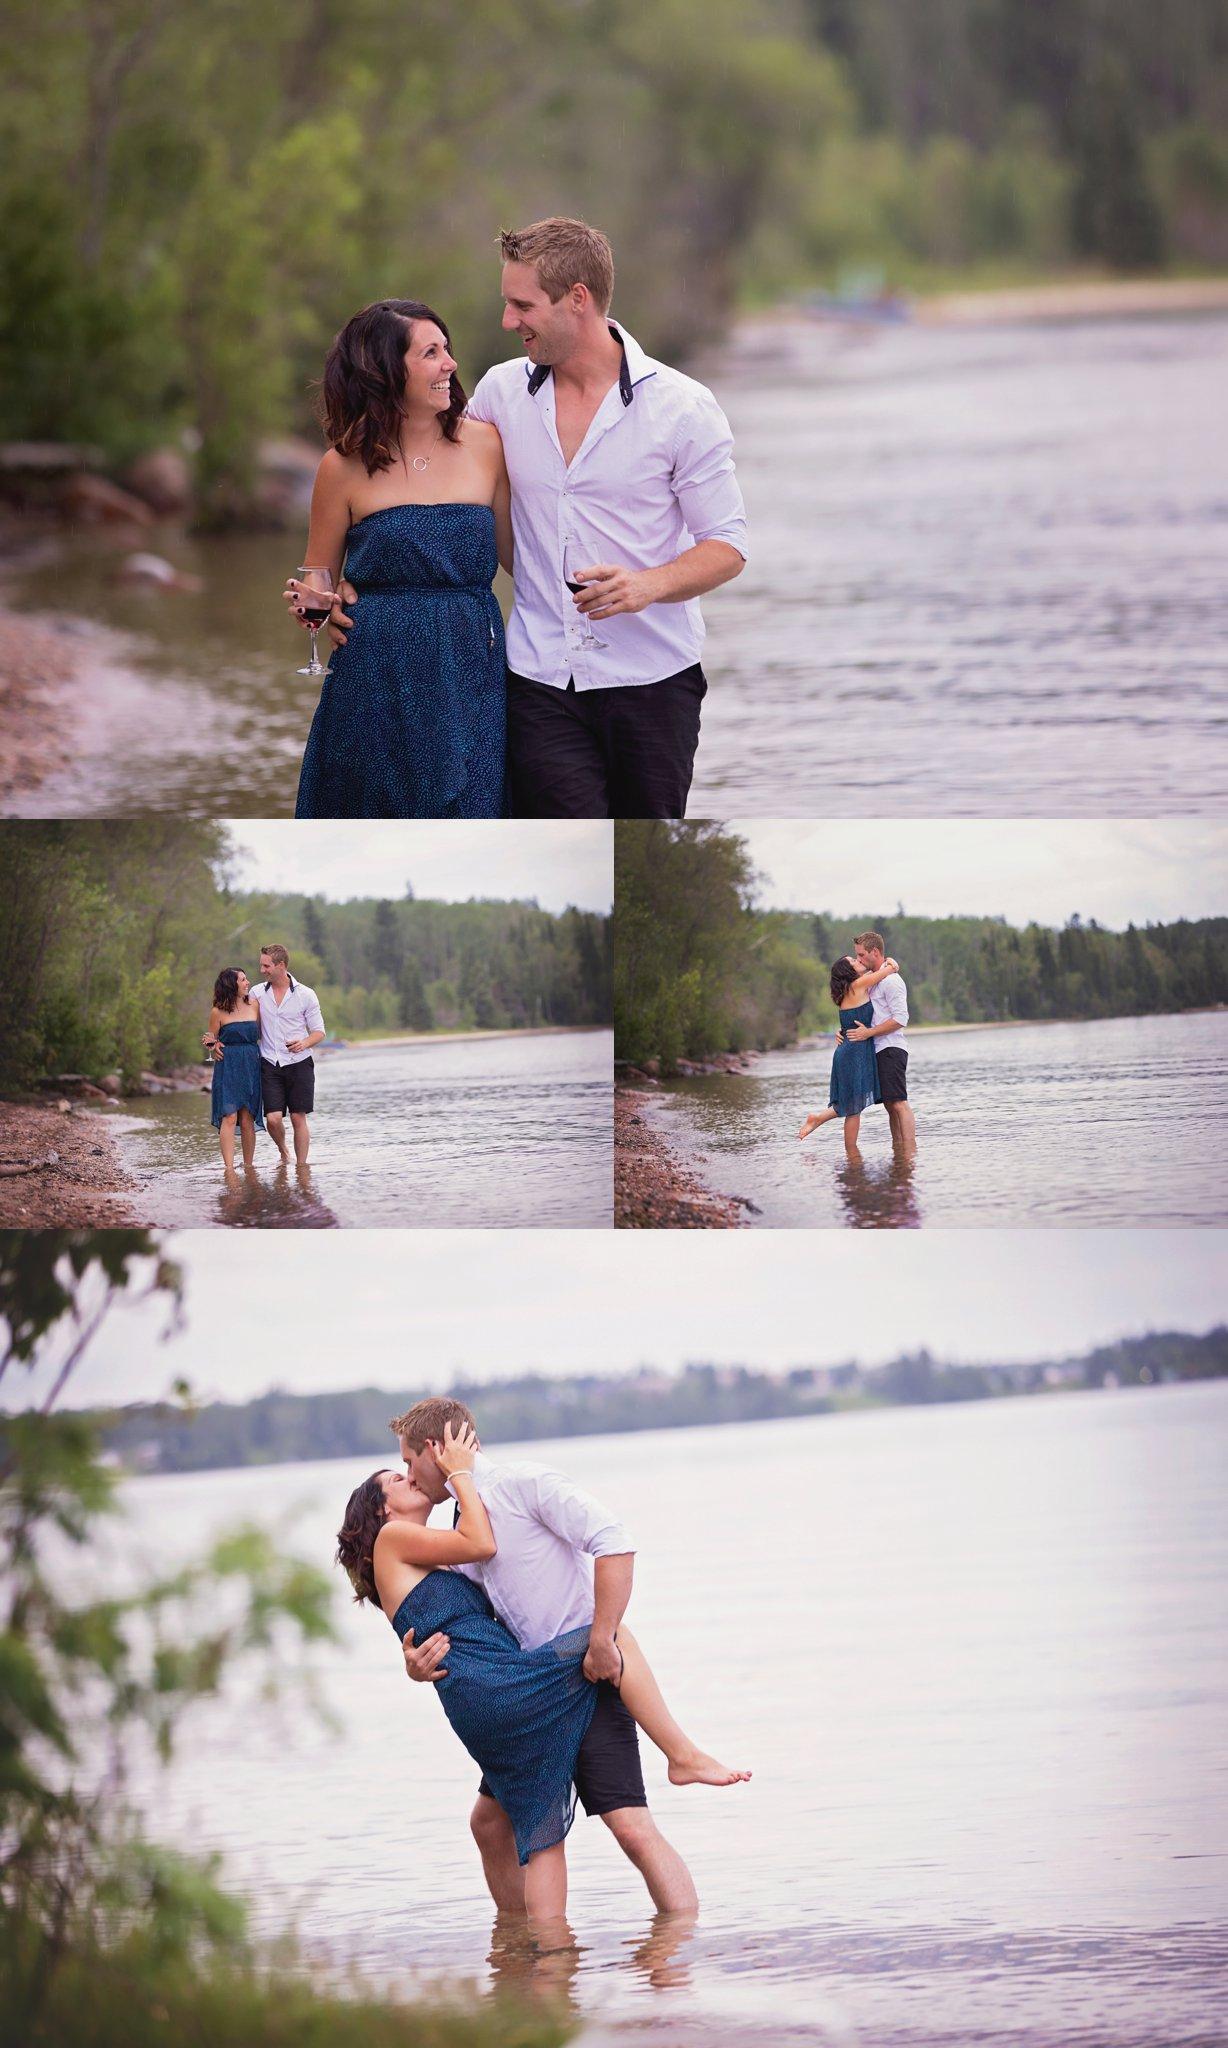 romantic engagement photos.jpg